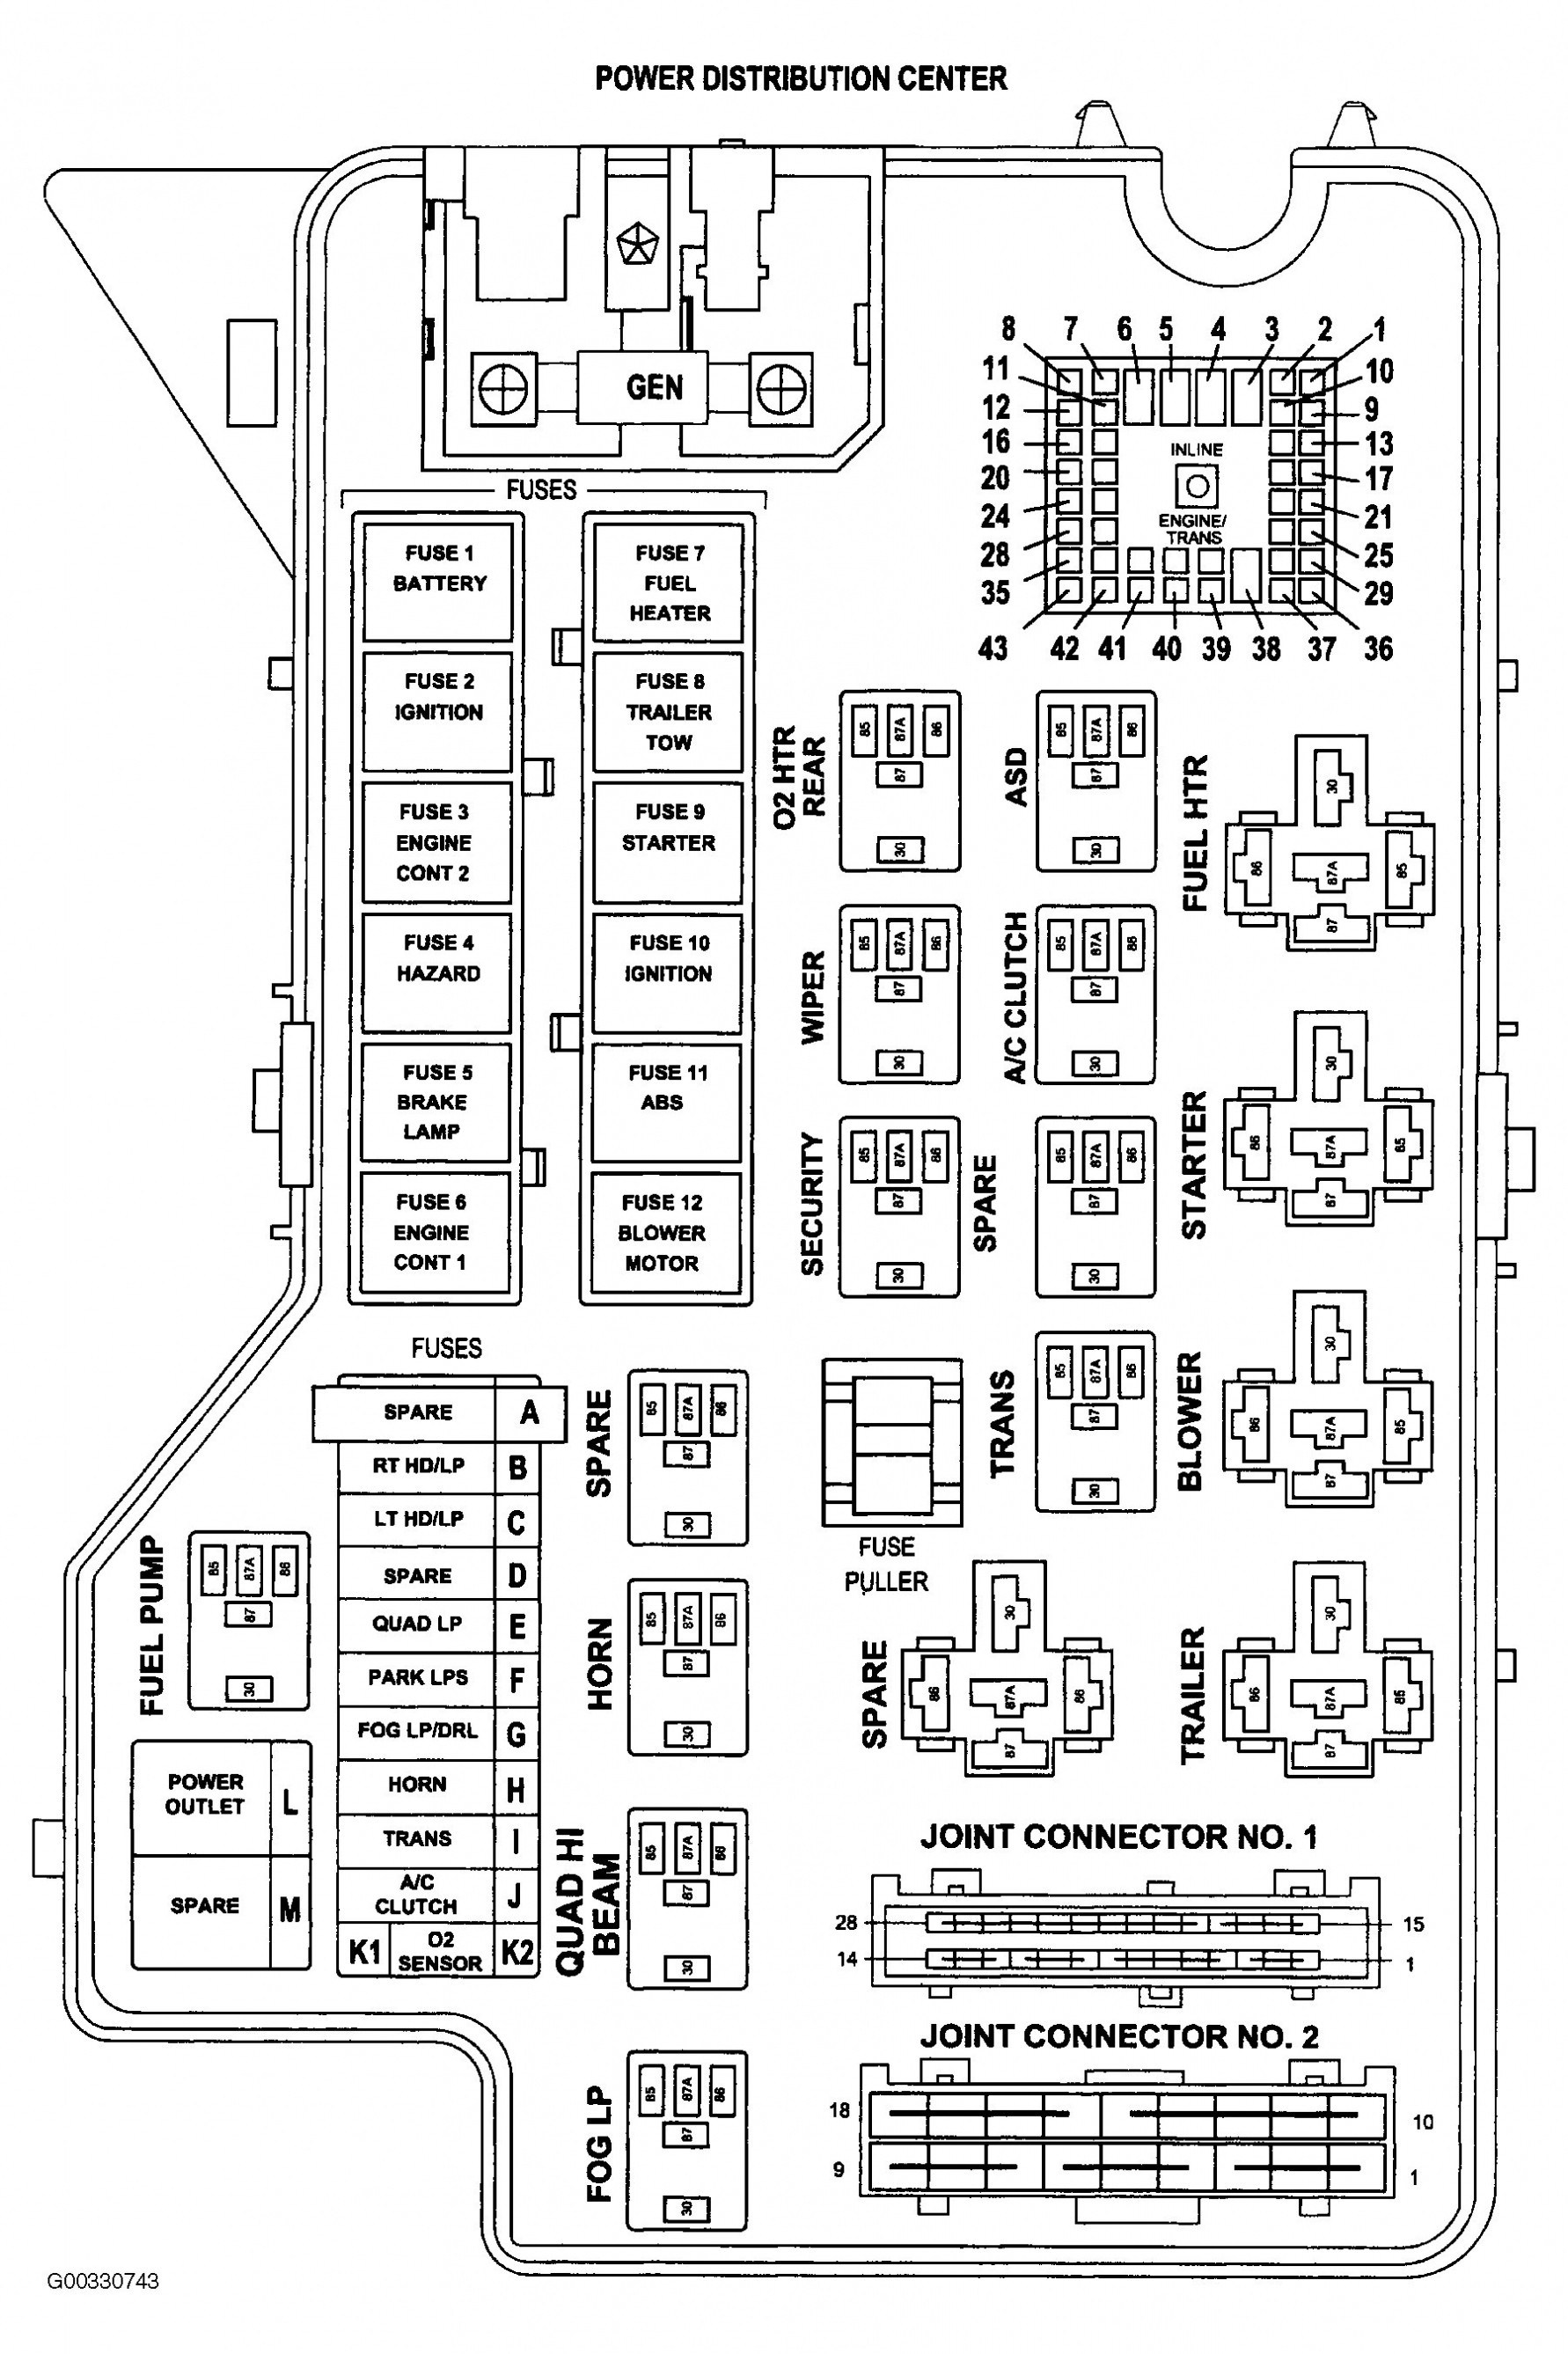 1957 dodge truck wiring diagram ye 8420  dodge b 1 power wagon wiring diagram all about wiring  dodge b 1 power wagon wiring diagram